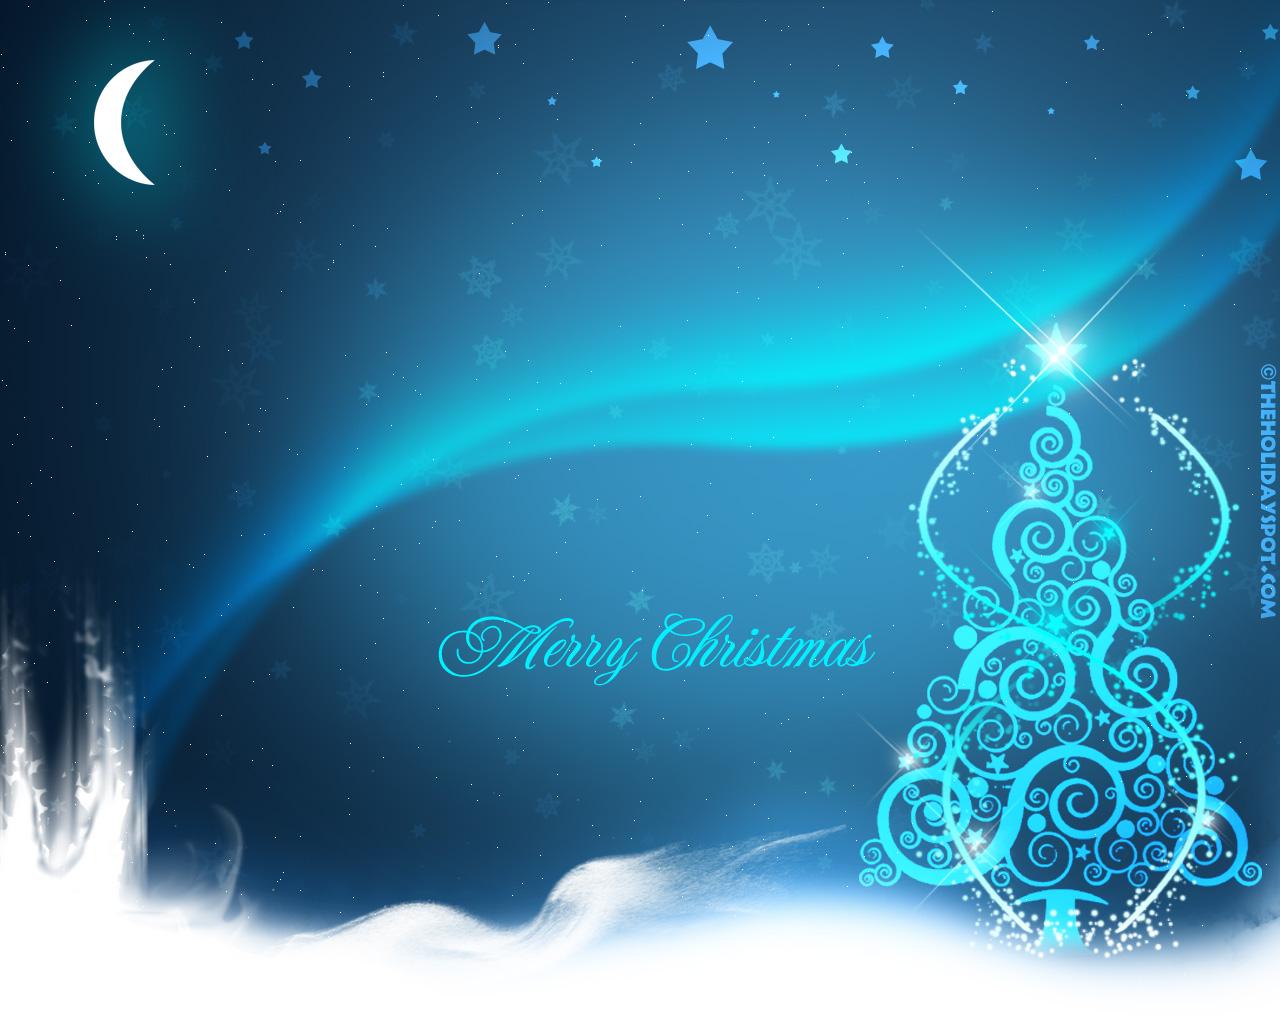 Christmas - cynthia-selahblue (cynti19) Wallpaper (27864623) - Fanpop